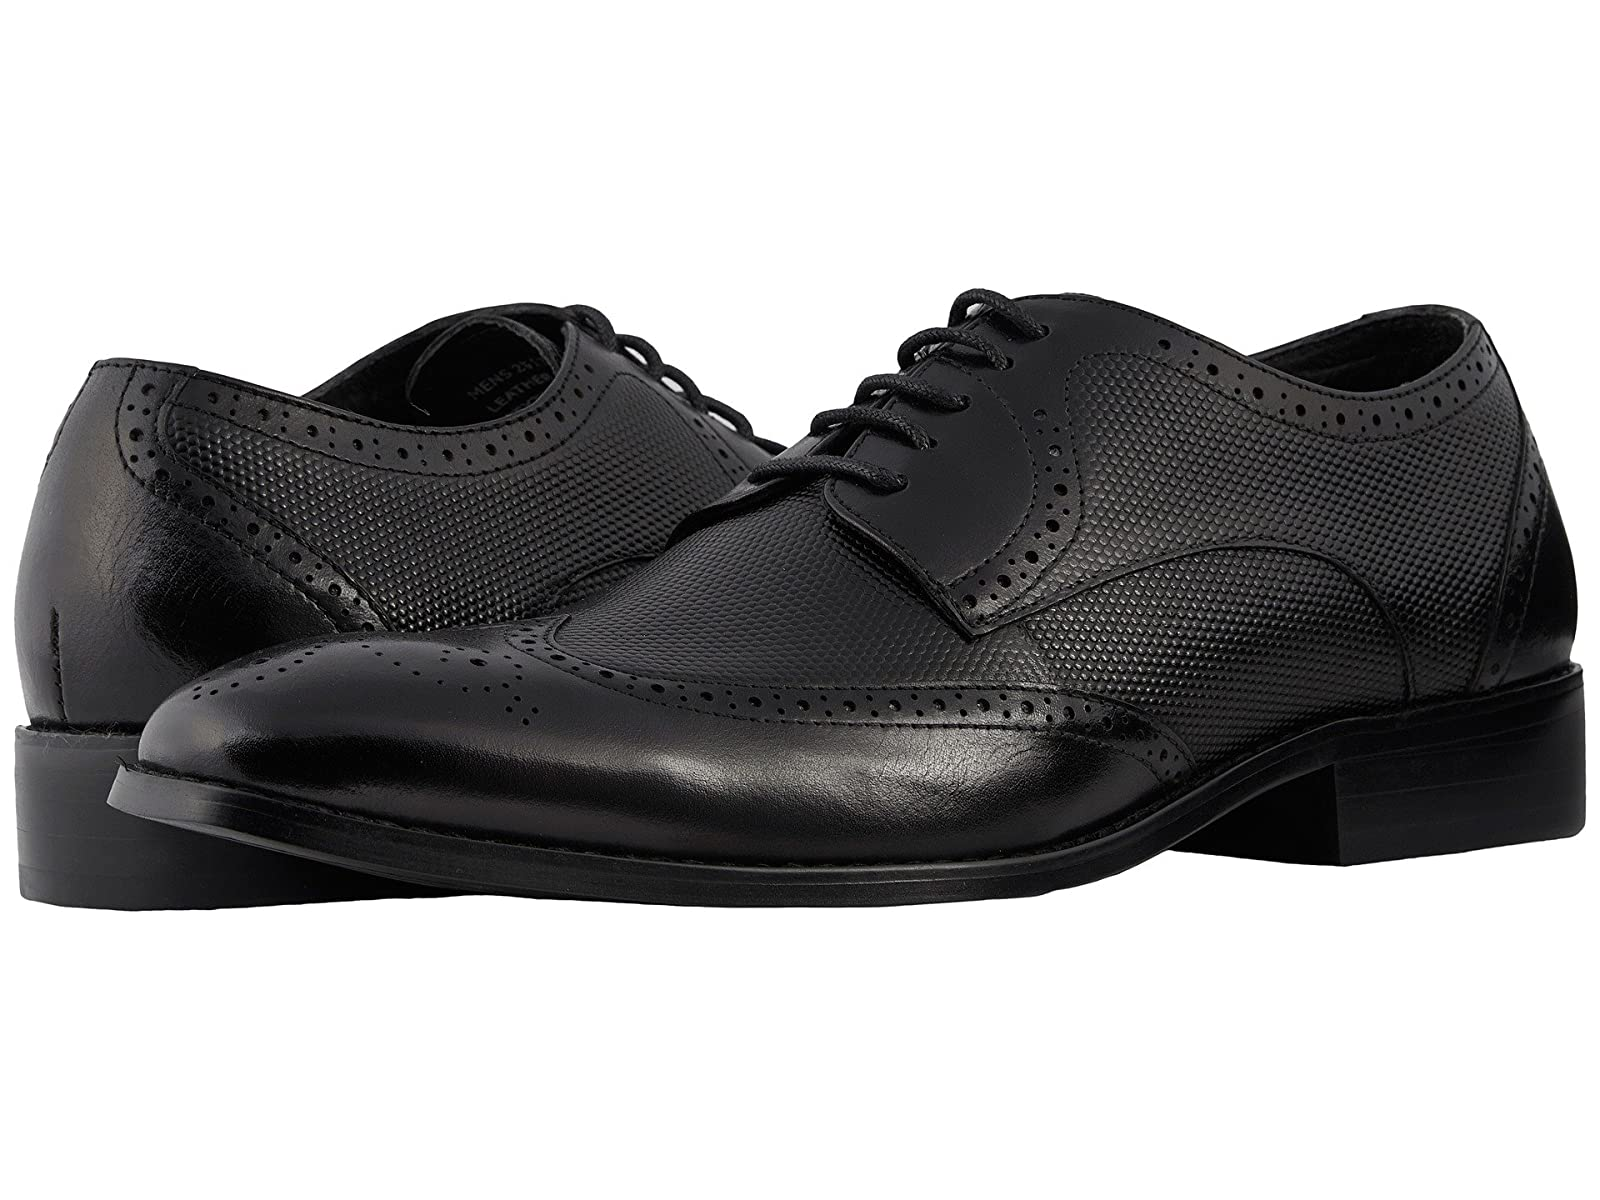 Stacy Adams LindellAtmospheric grades have affordable shoes